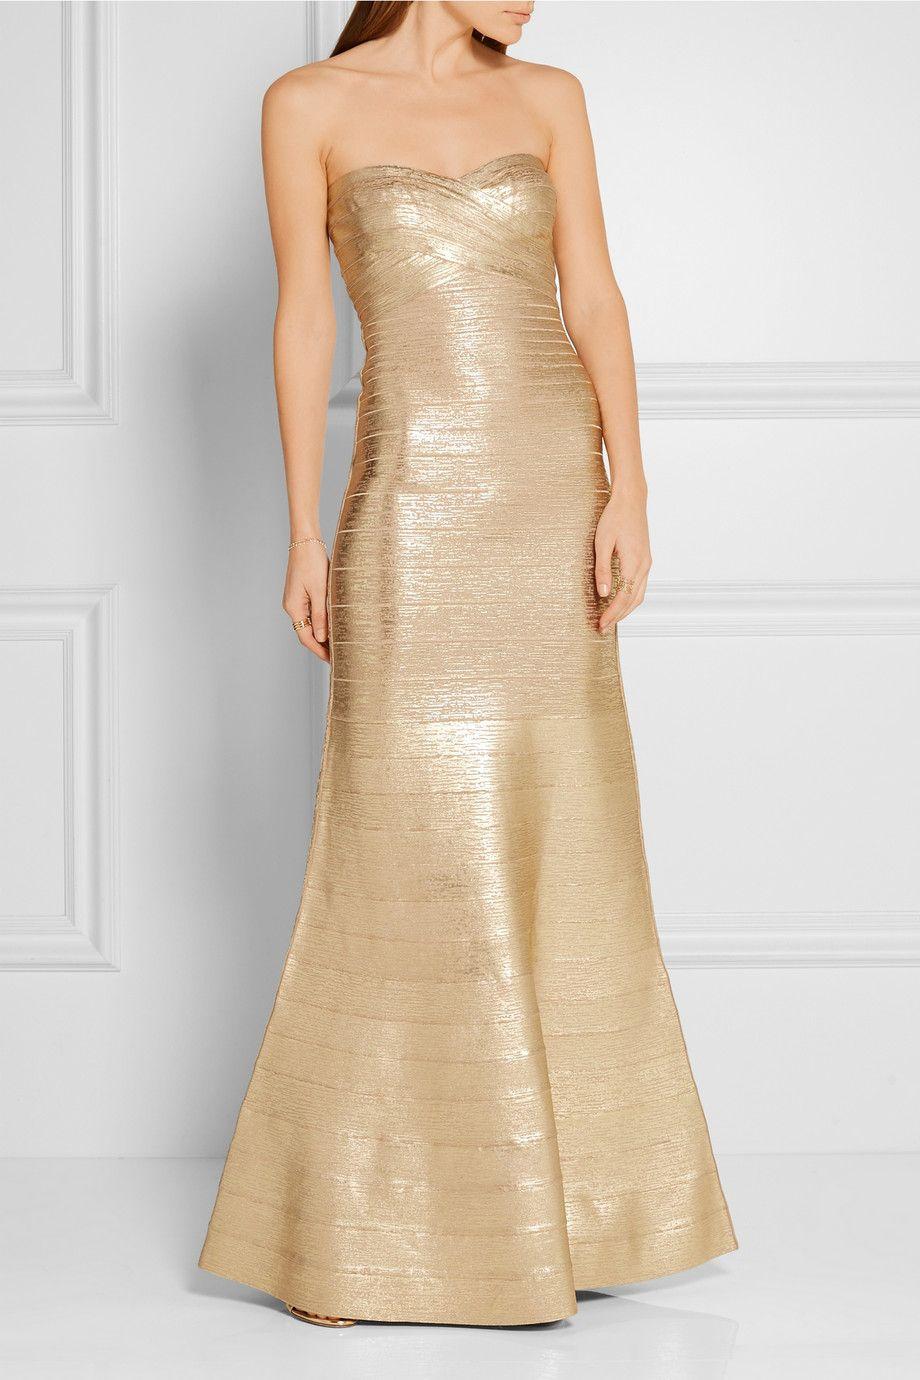 HervÉ lÉger sara strapless metallic bandage gown fashion lust